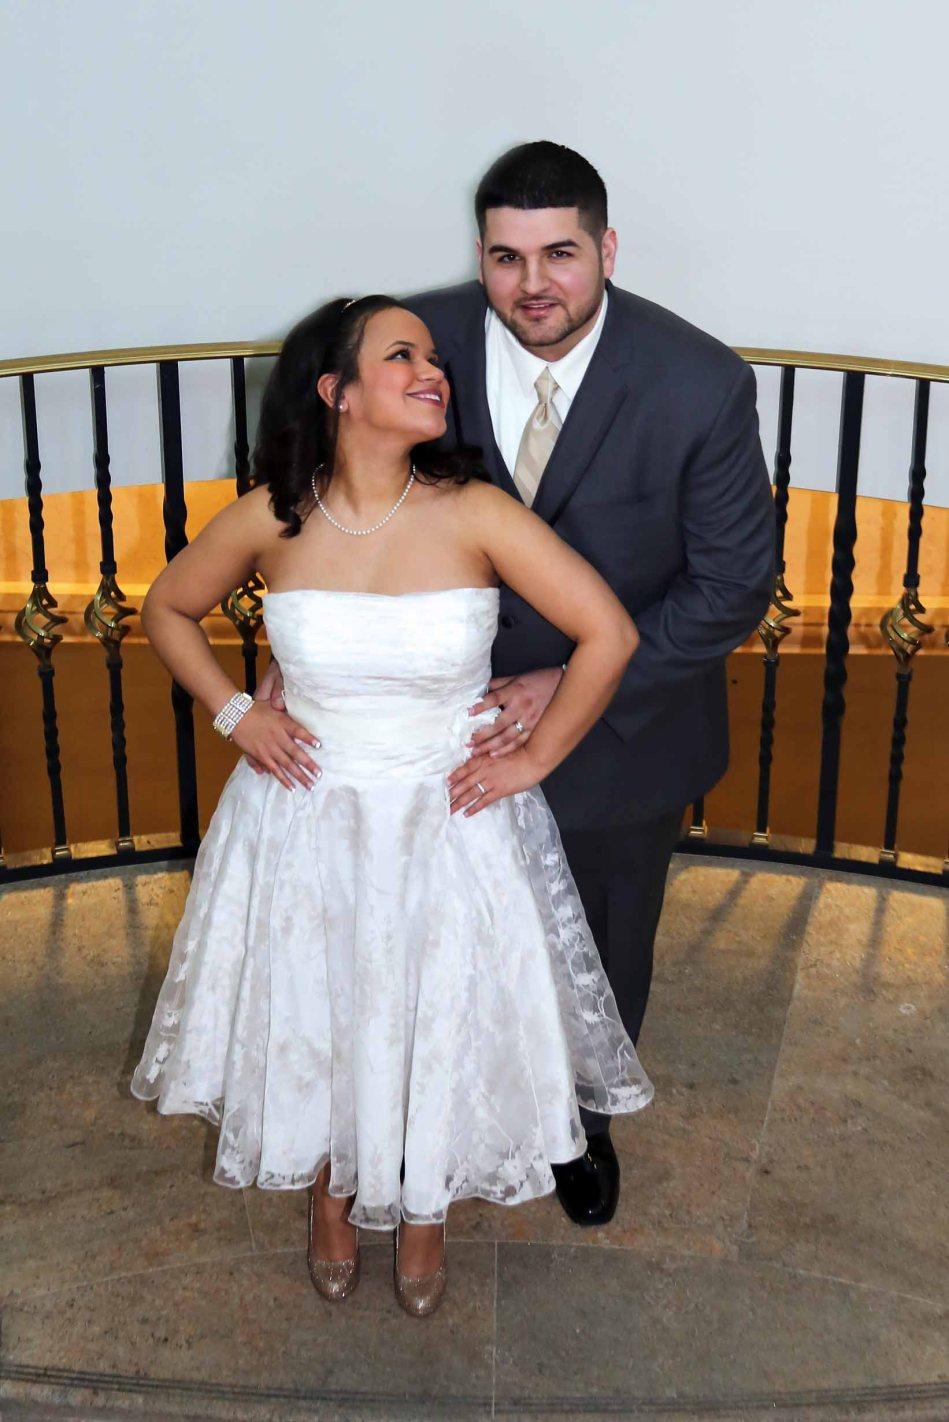 bride and groom-wedding photos-perth amboy municipal court